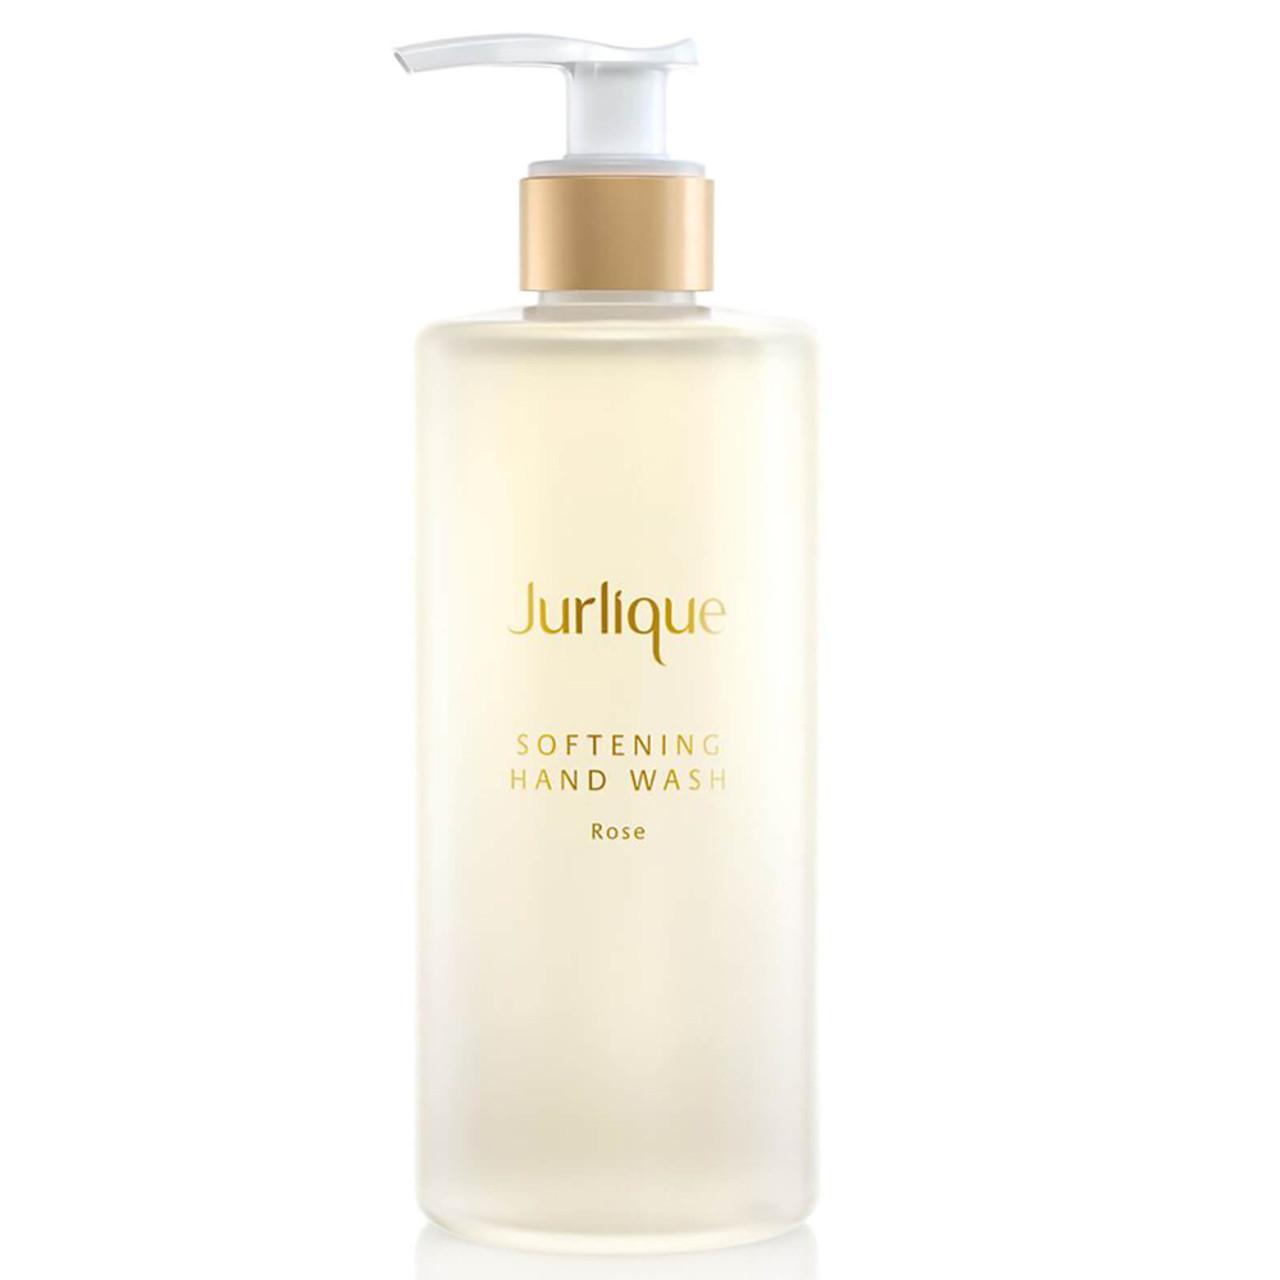 Jurlique Softening Rose Hand Wash BeautifiedYou.com